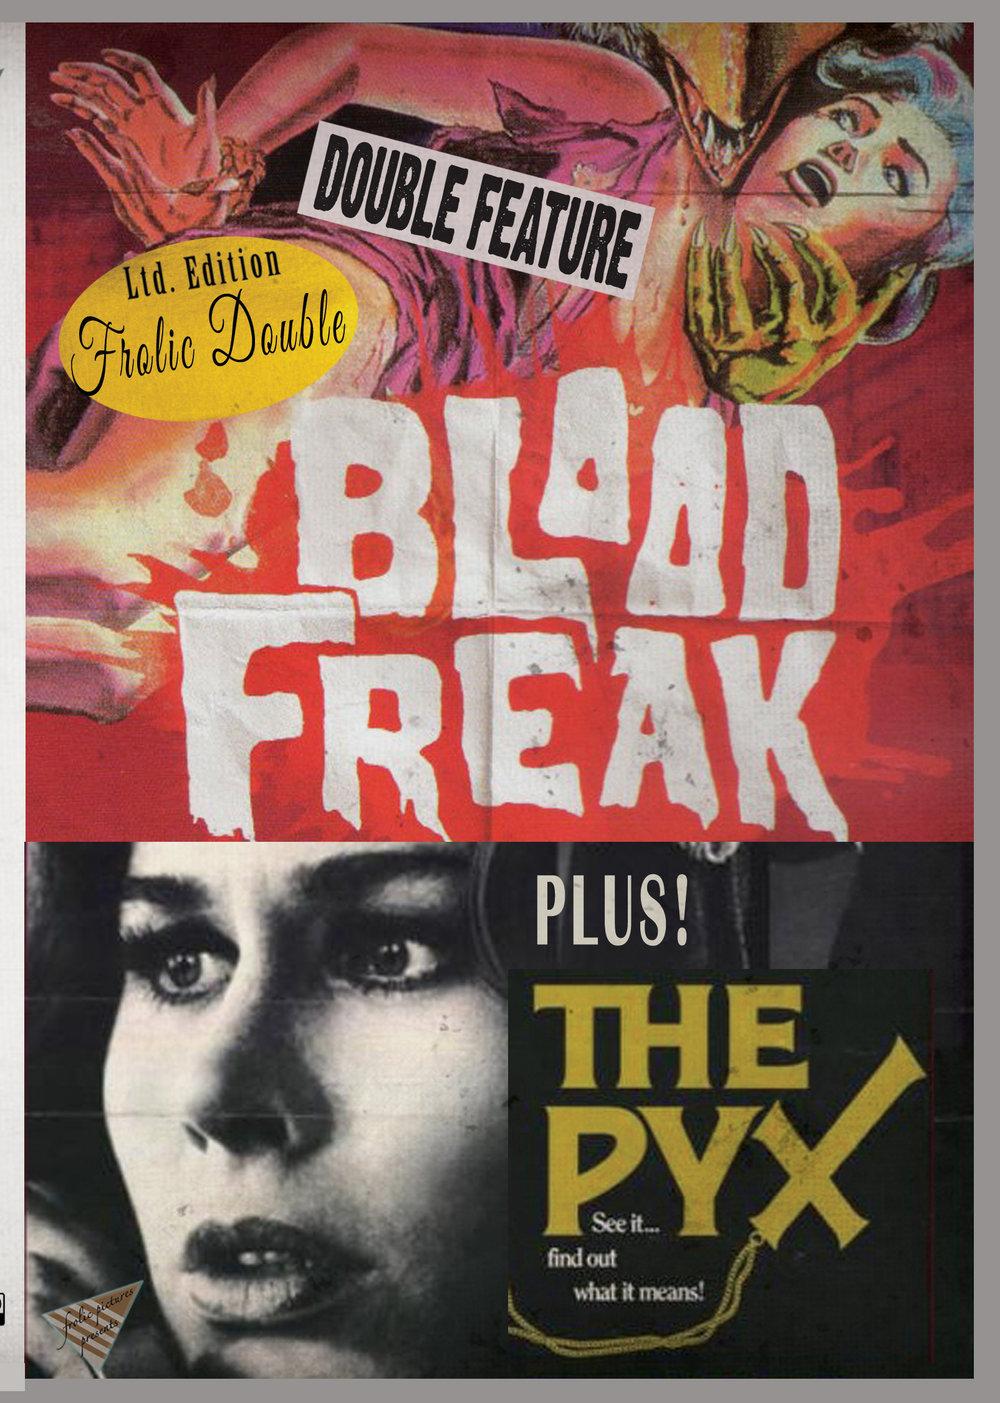 Blood Freak The Pyx Poster.jpg